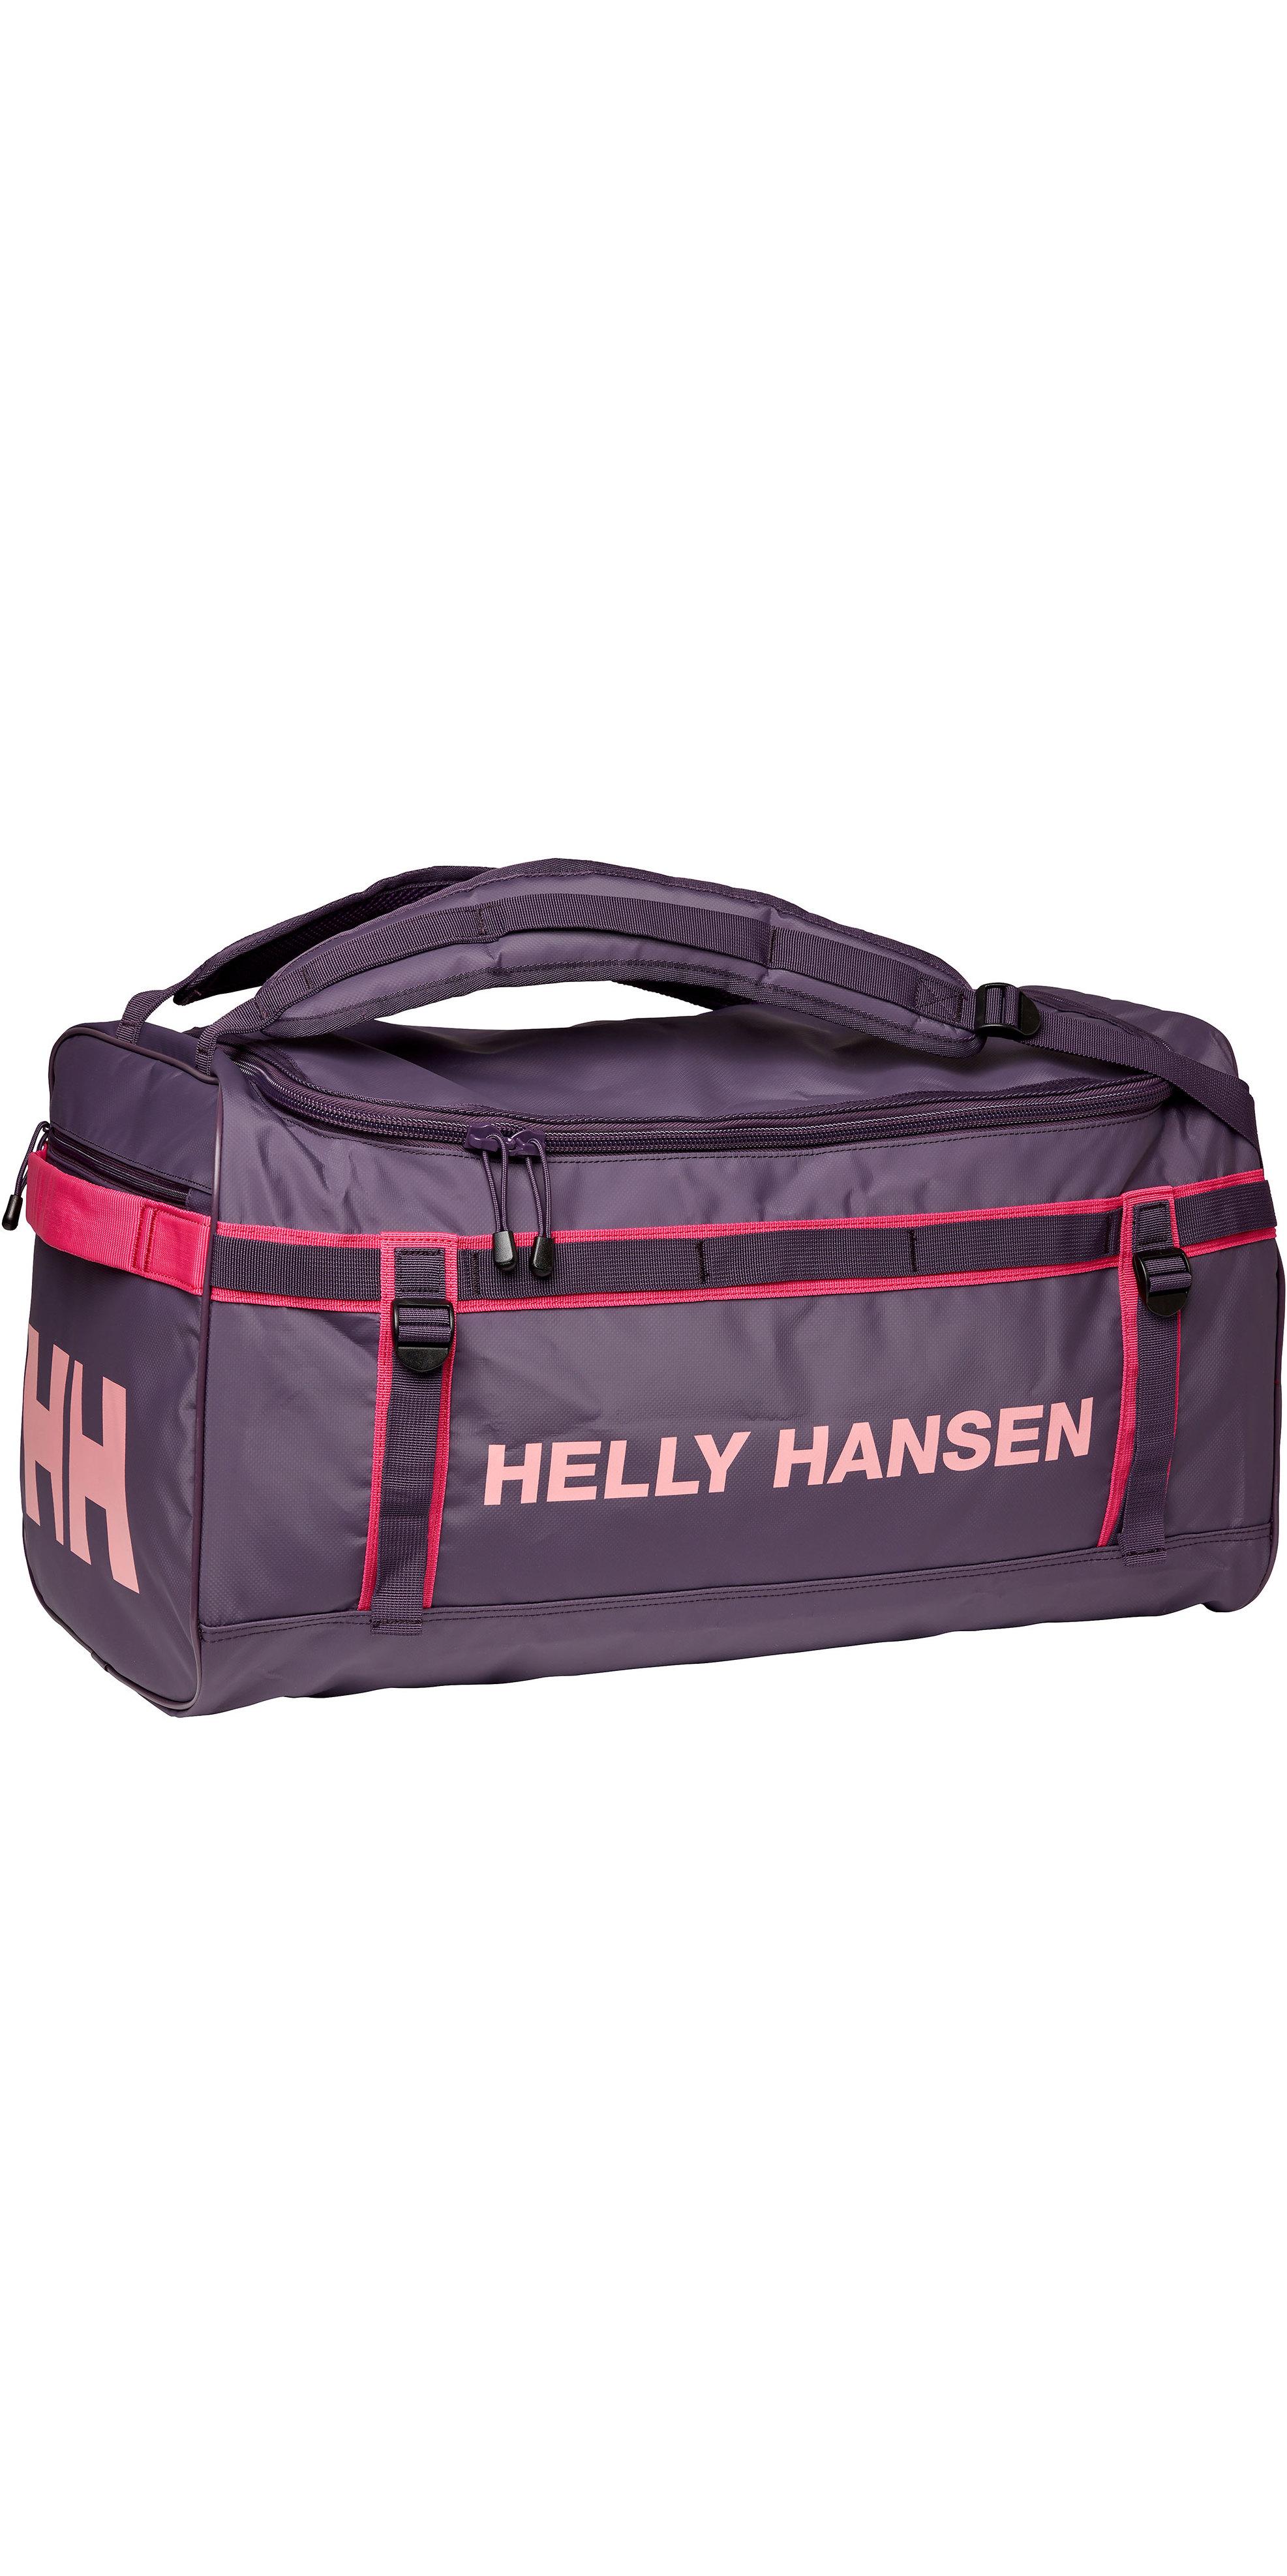 Helly Hansen Classic Bag Duffel